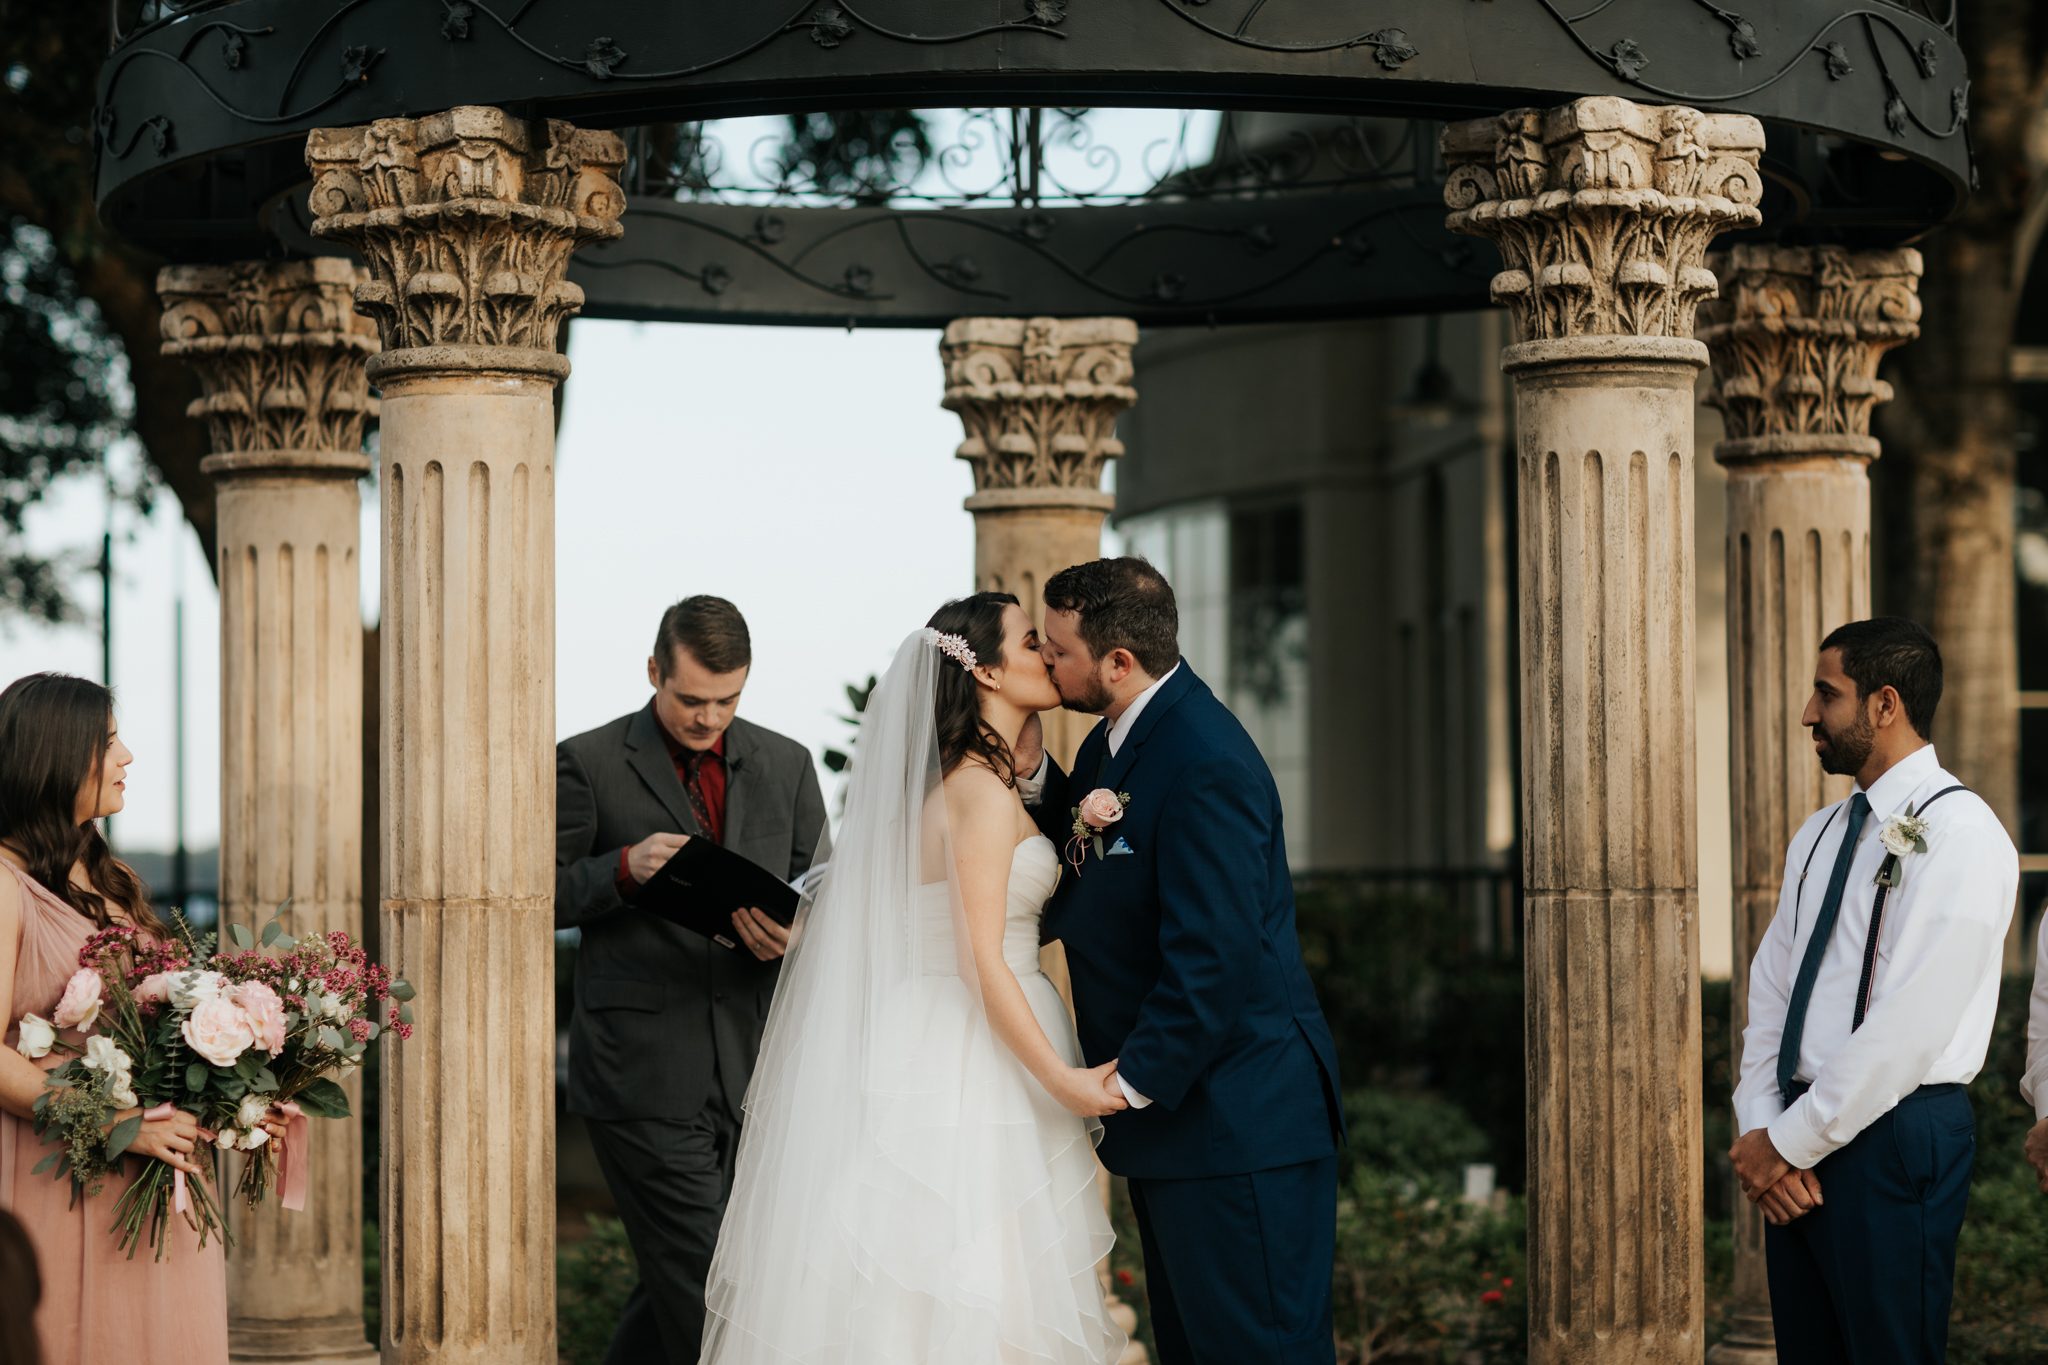 Leah Nicole Photography - Houston Wedding Photographer-Lake Conroe Wedding- Houston Wedding Photographer-34.jpg